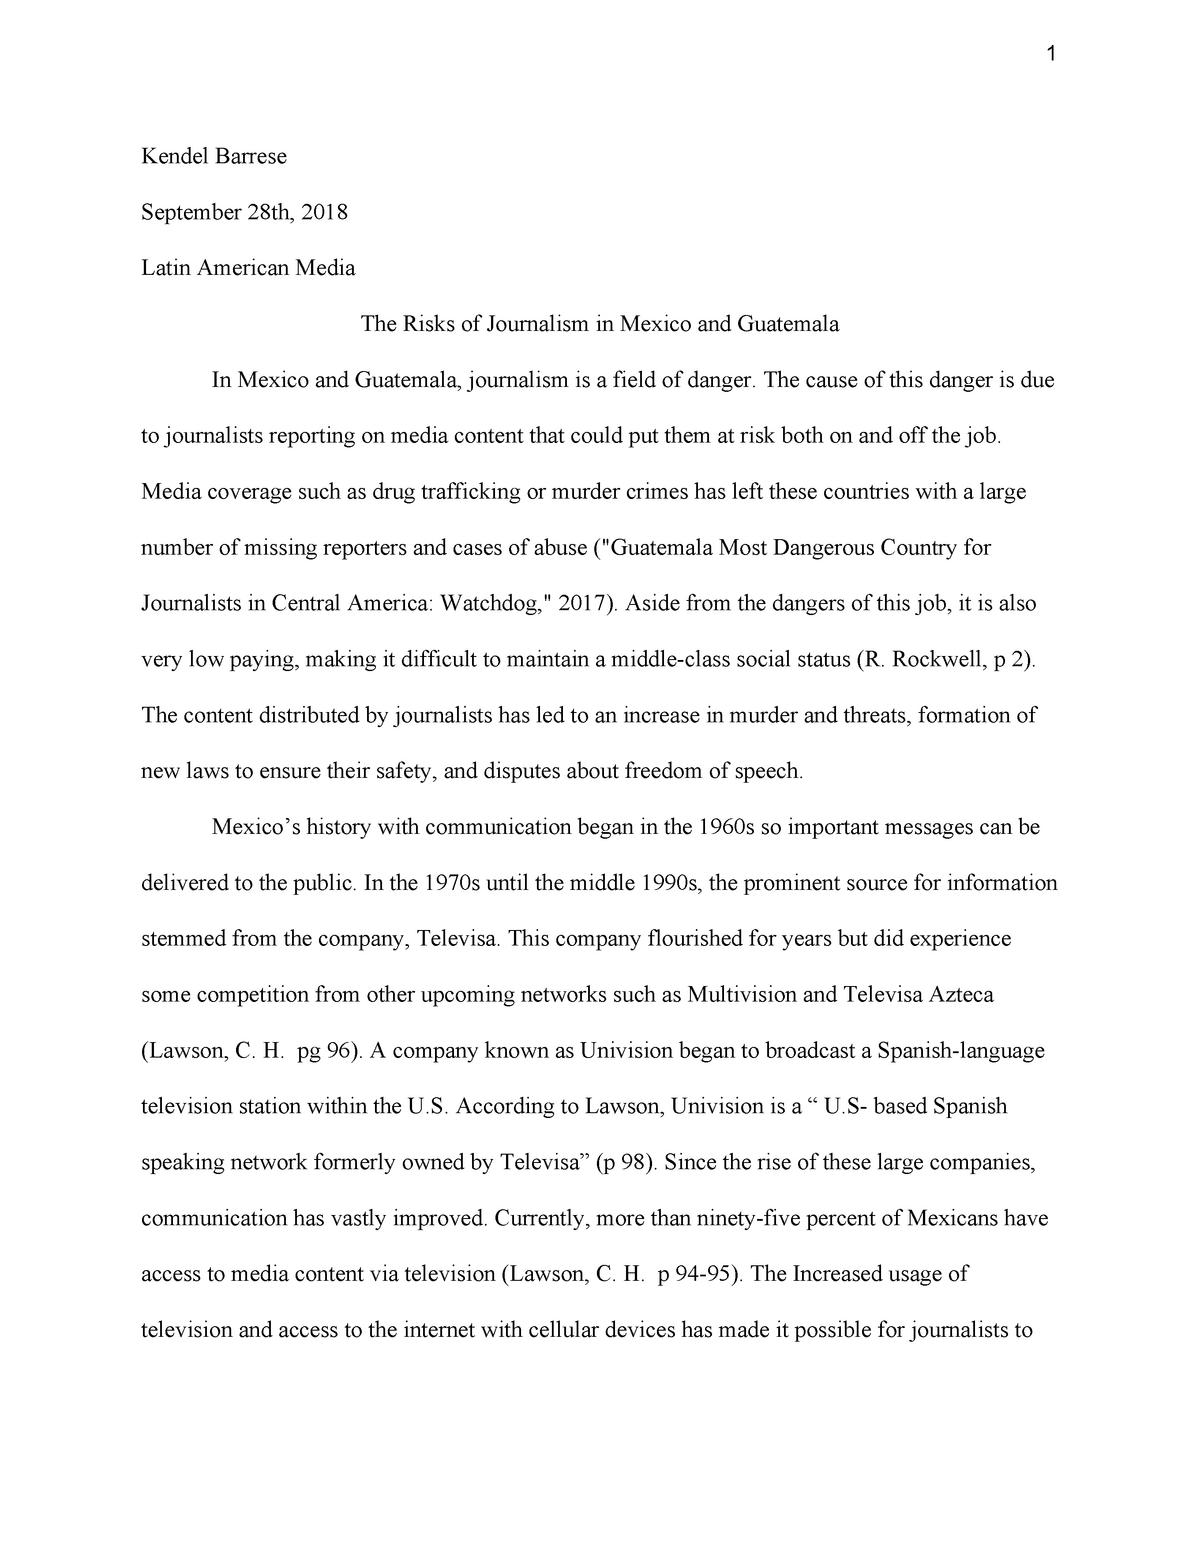 Latin Media Paper 1 - Grade: 90 - MSP 0823: Latin American